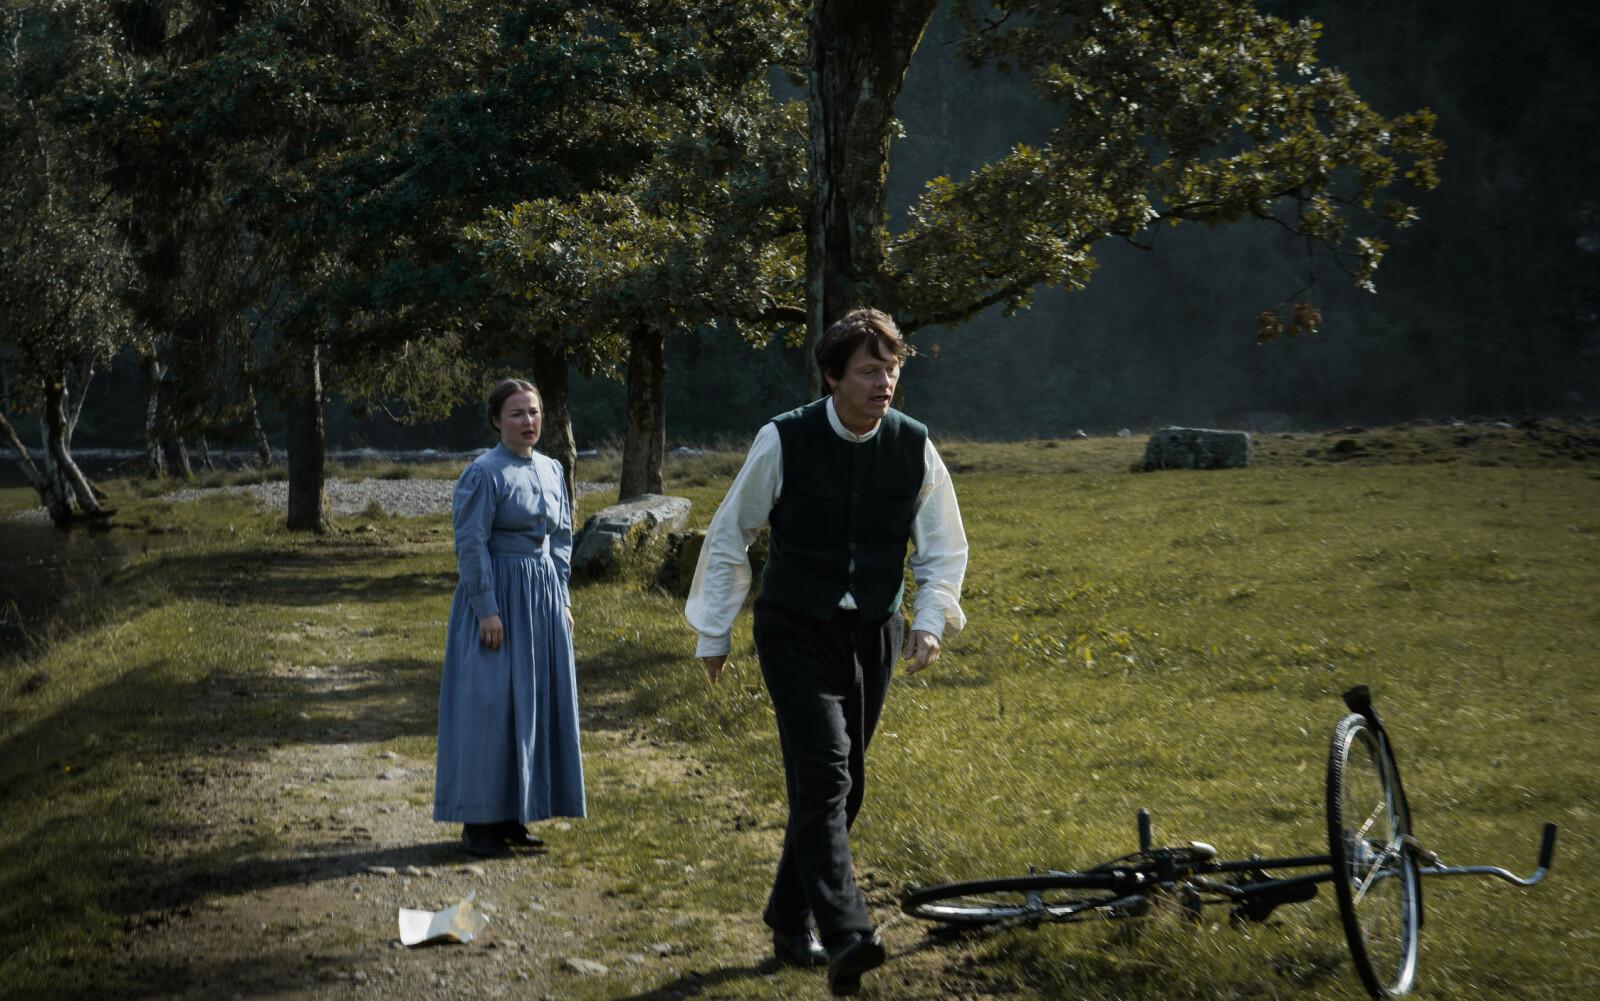 UNG KONE: Henriette Marø spiller Engel Astrup - den unge kona til Nikolai Astrup. FOTO: Norsk Filmdistribusjon / Handmade films in Norwegian Woods